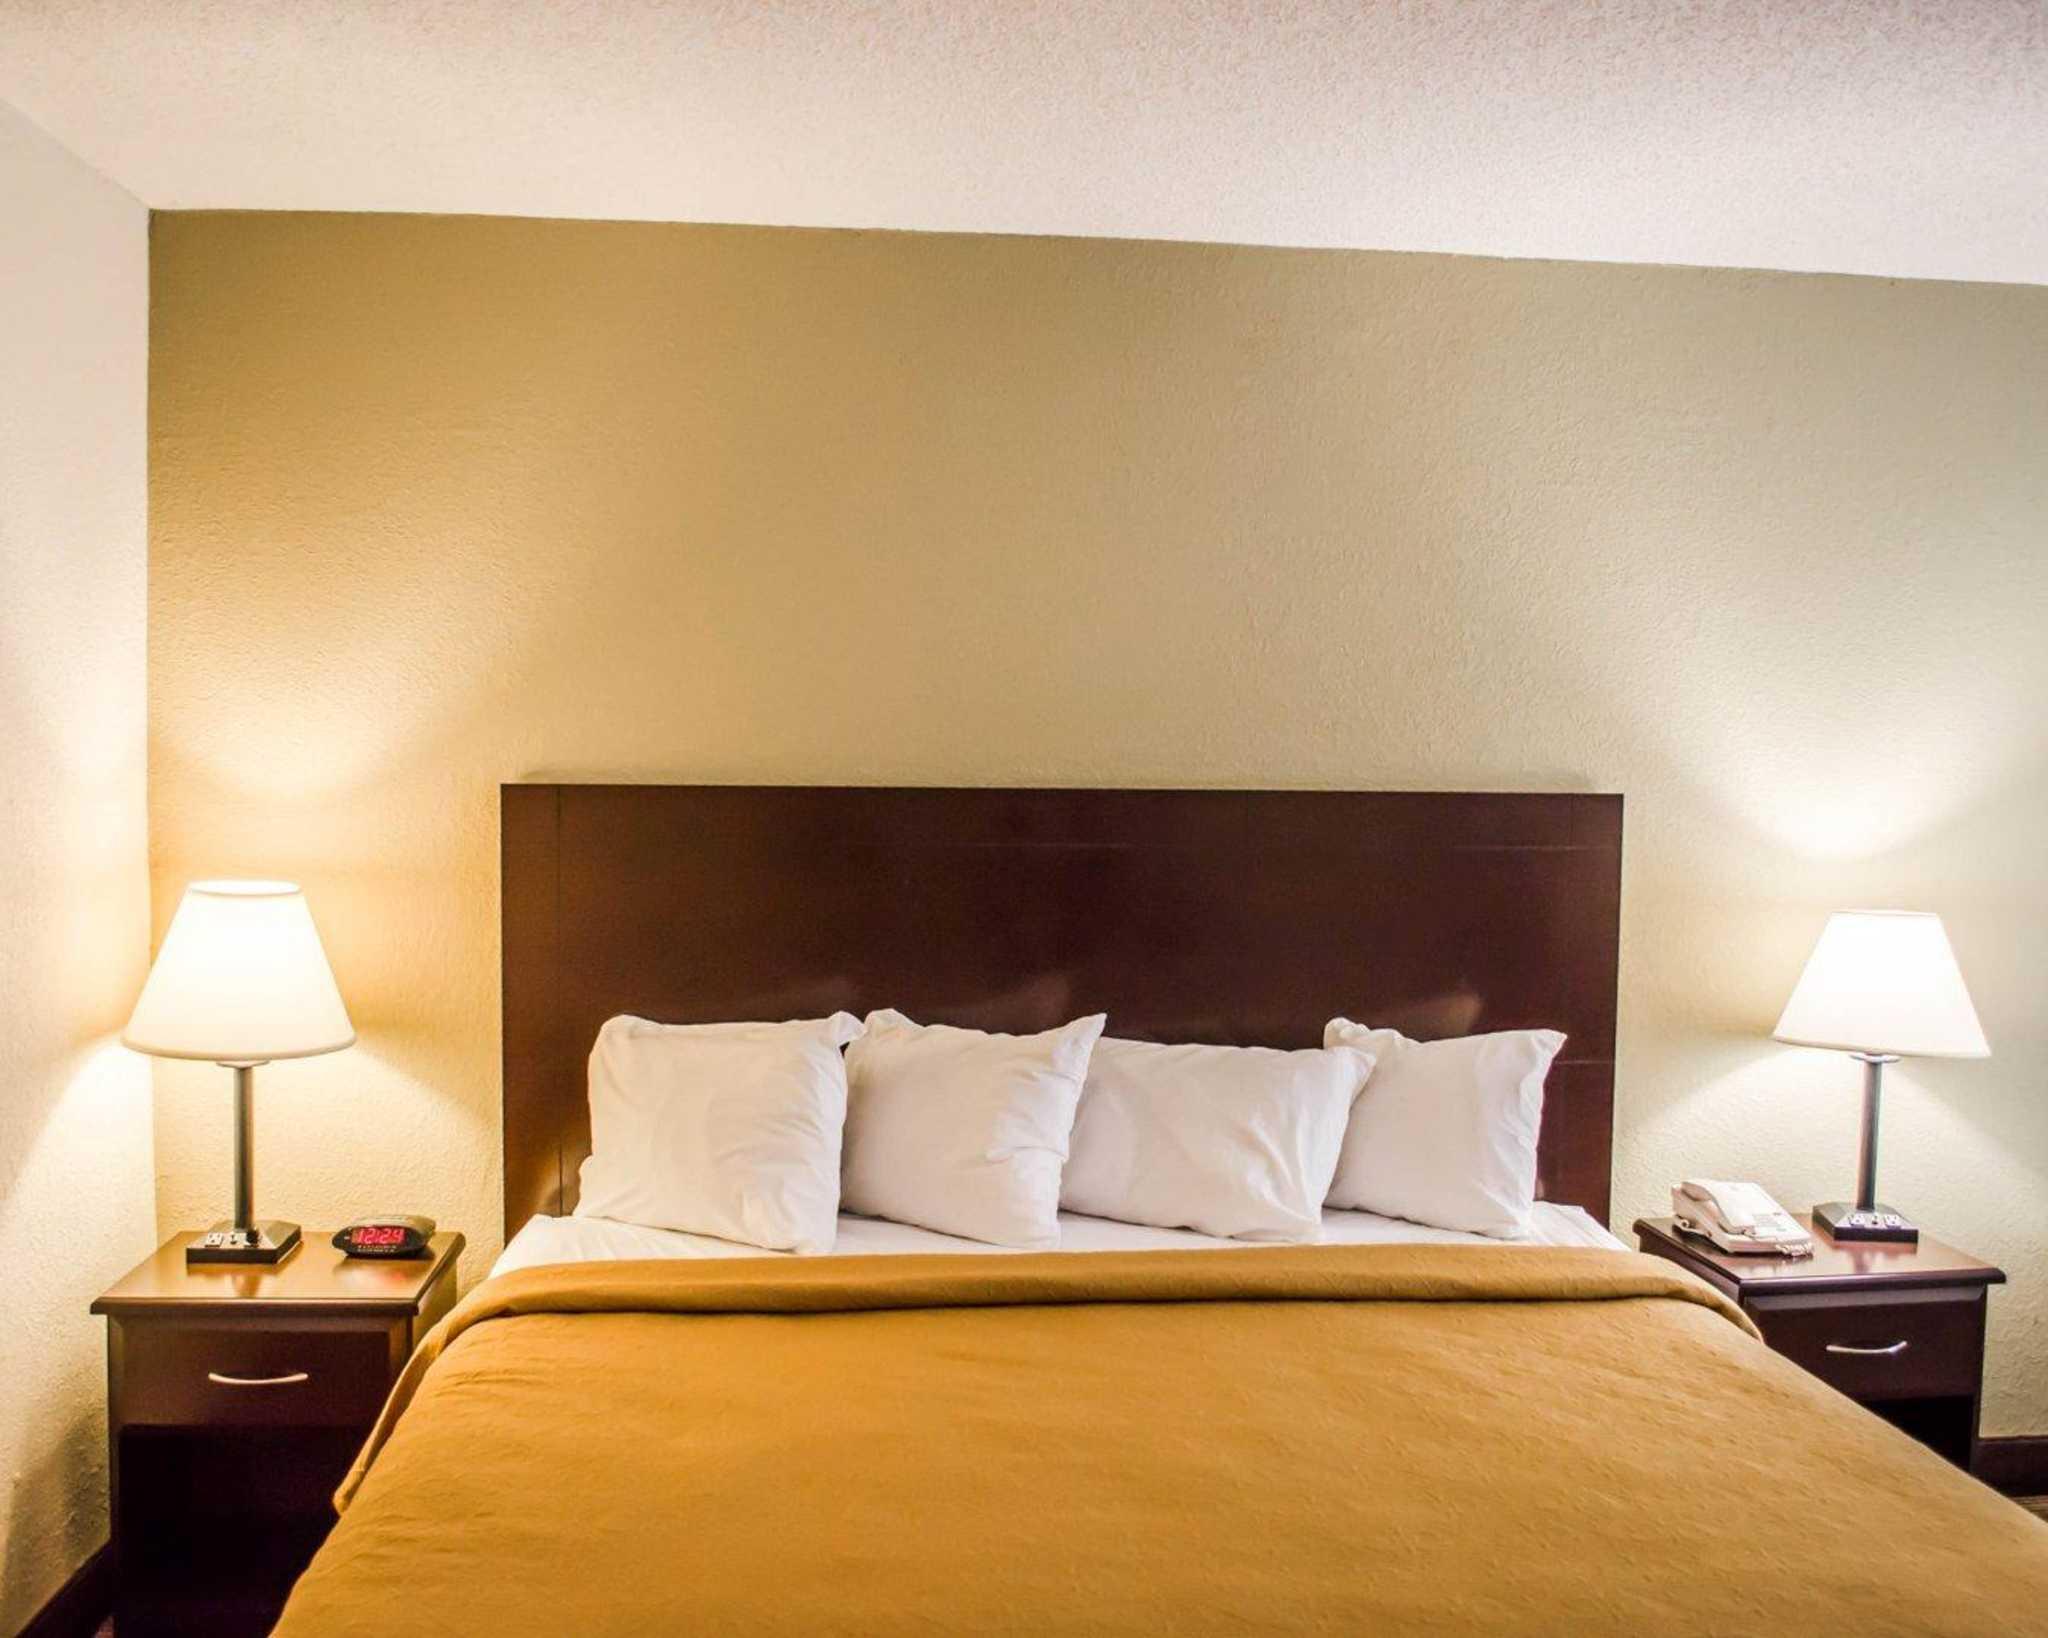 Quality Inn & Suites Pensacola Bayview in Pensacola, FL, photo #11